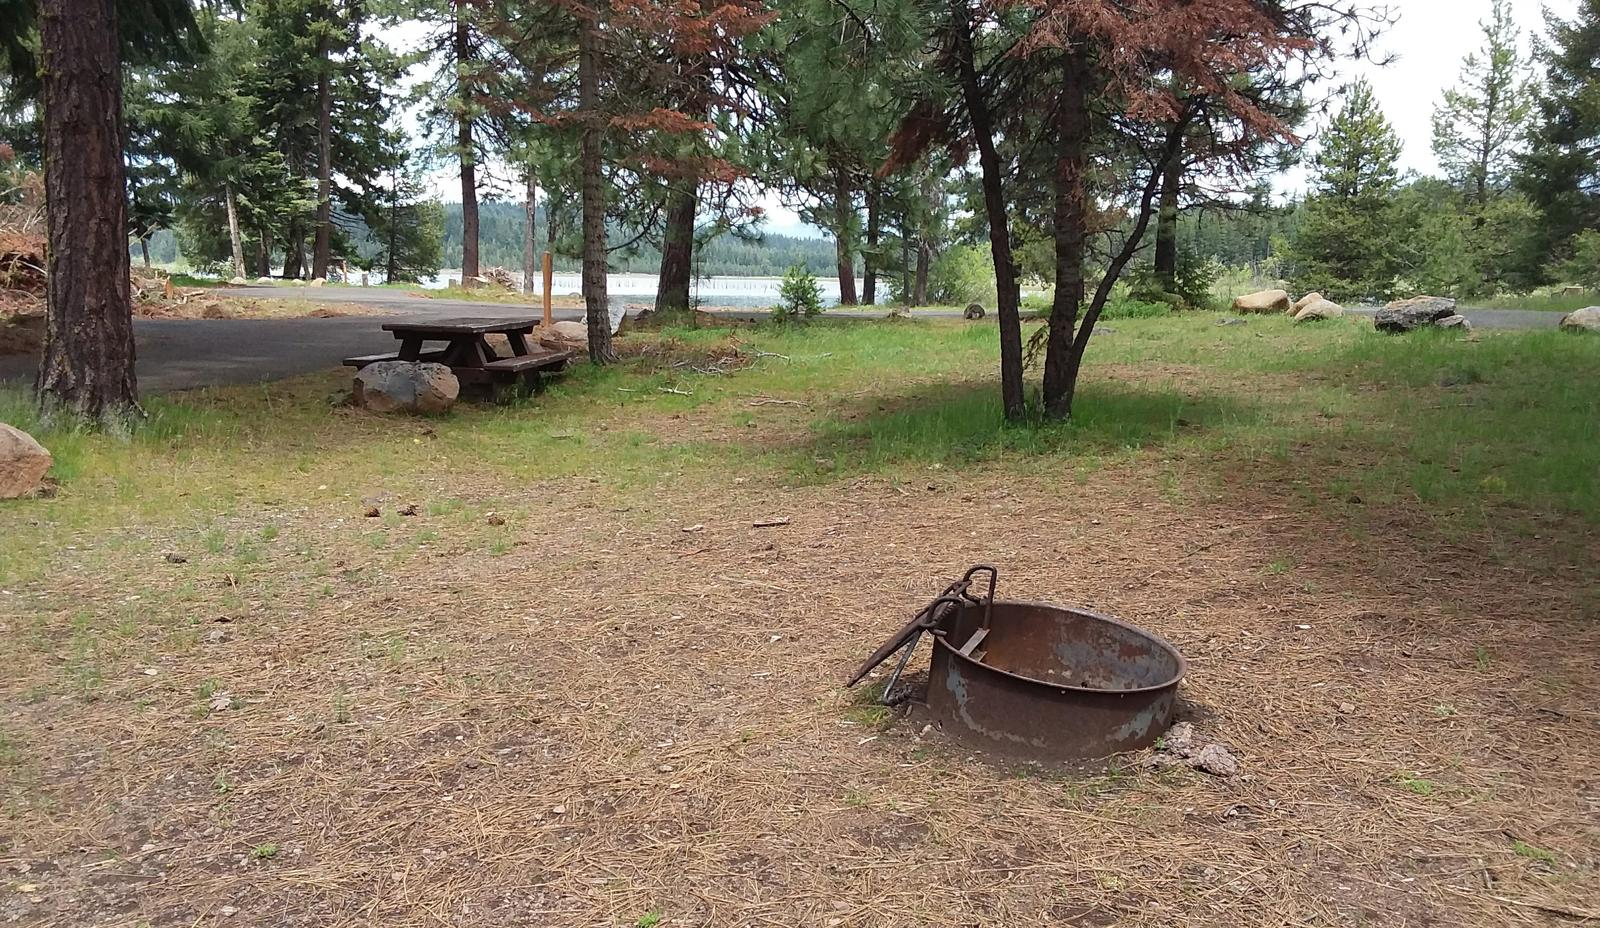 Campsite Overview